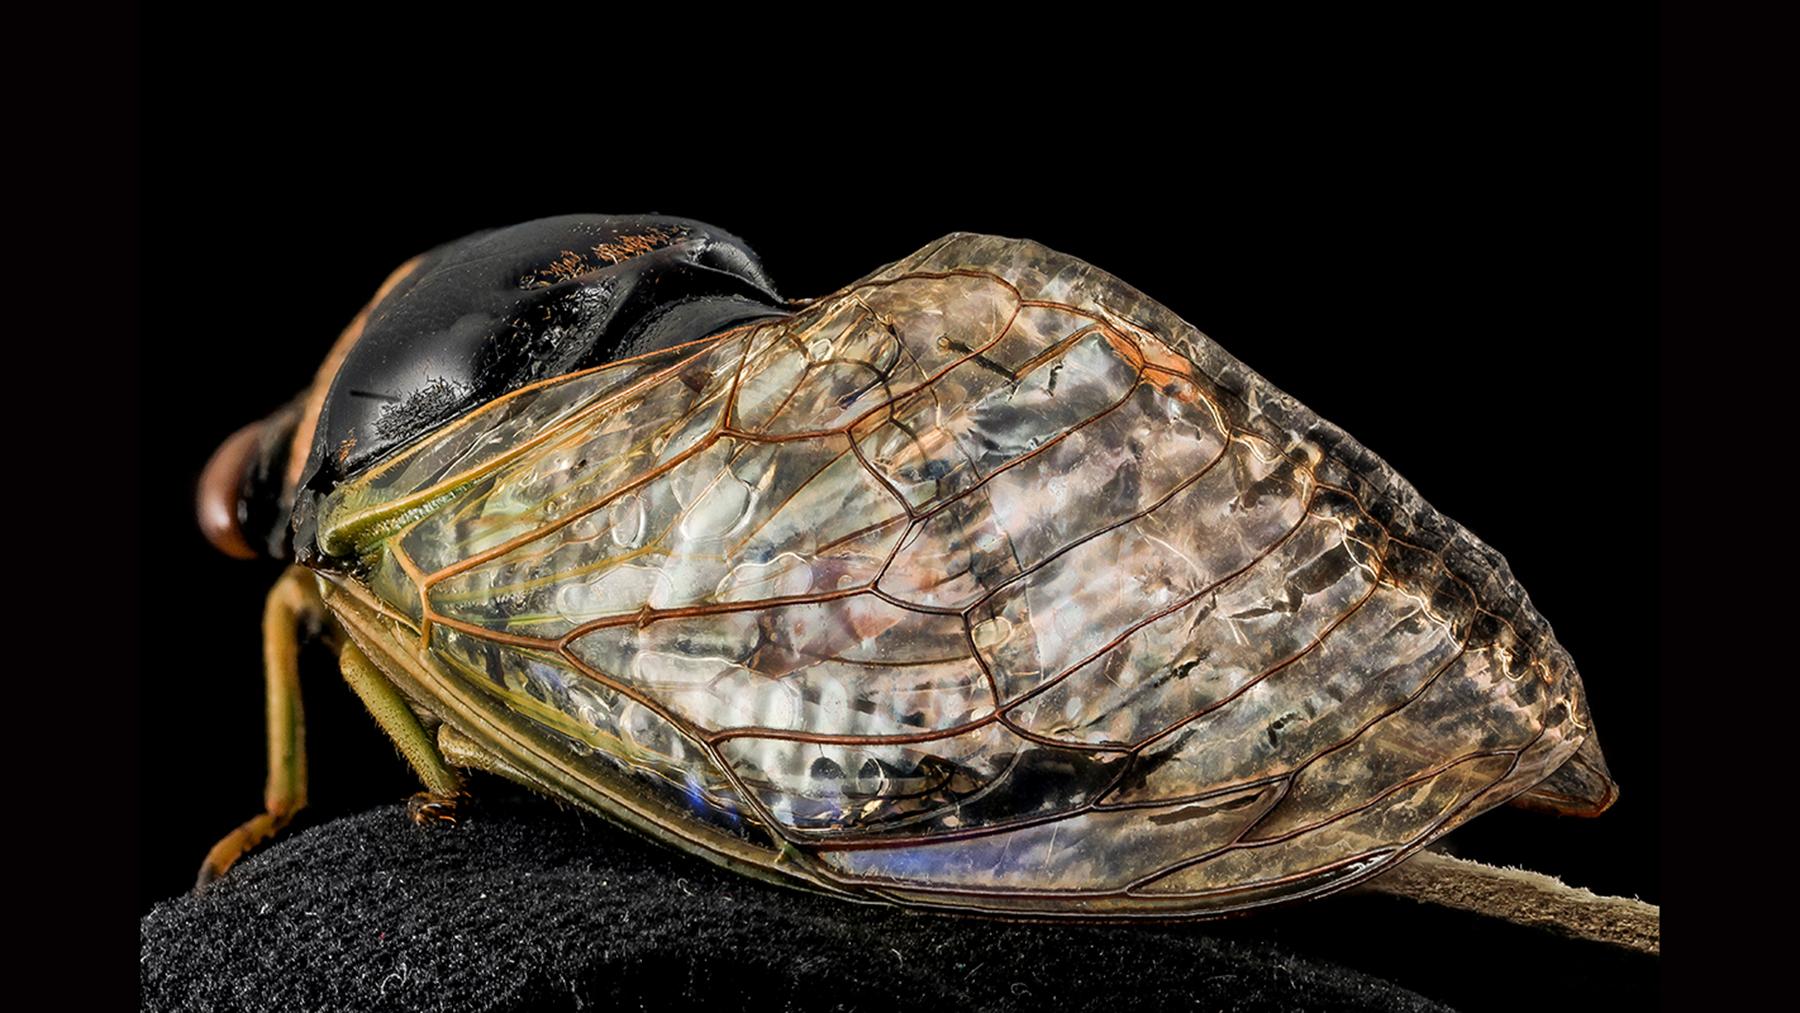 cicada close-up photo by Wayne Boo, U.S. Geological Survey